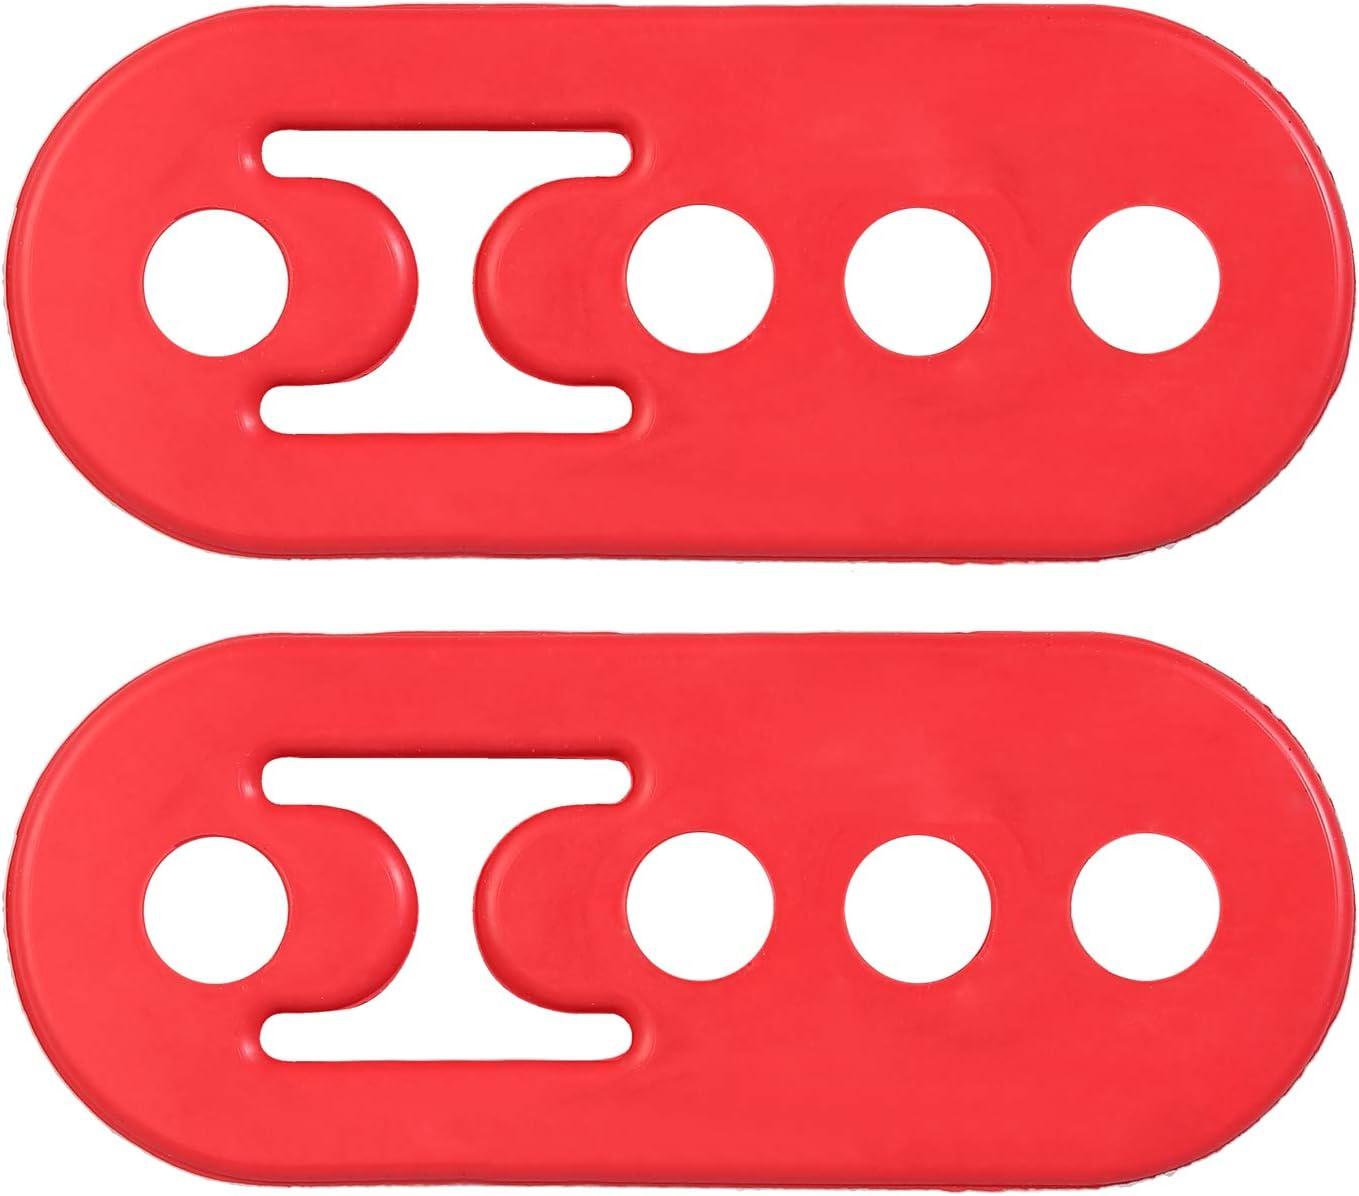 eSynic 2PCS Universal Red Heavy Duty Rubber Exhaust Mount Brackets Hangers 12mm 4Holes